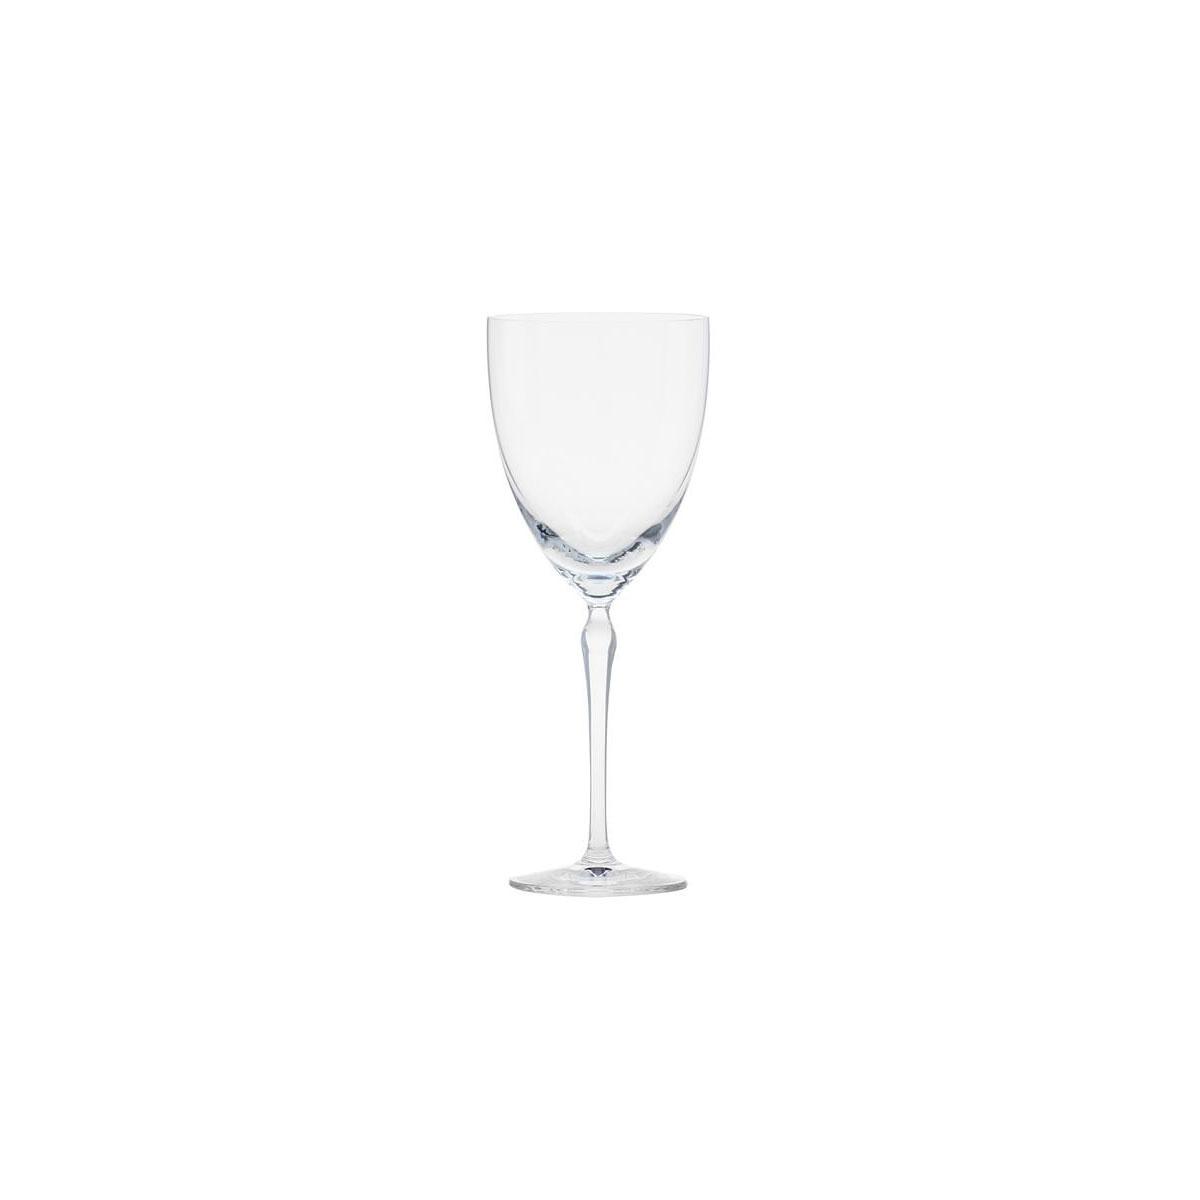 Schott Zwiesel Tritan Crystal, Audrey Crystal Red Wine Glass, Single